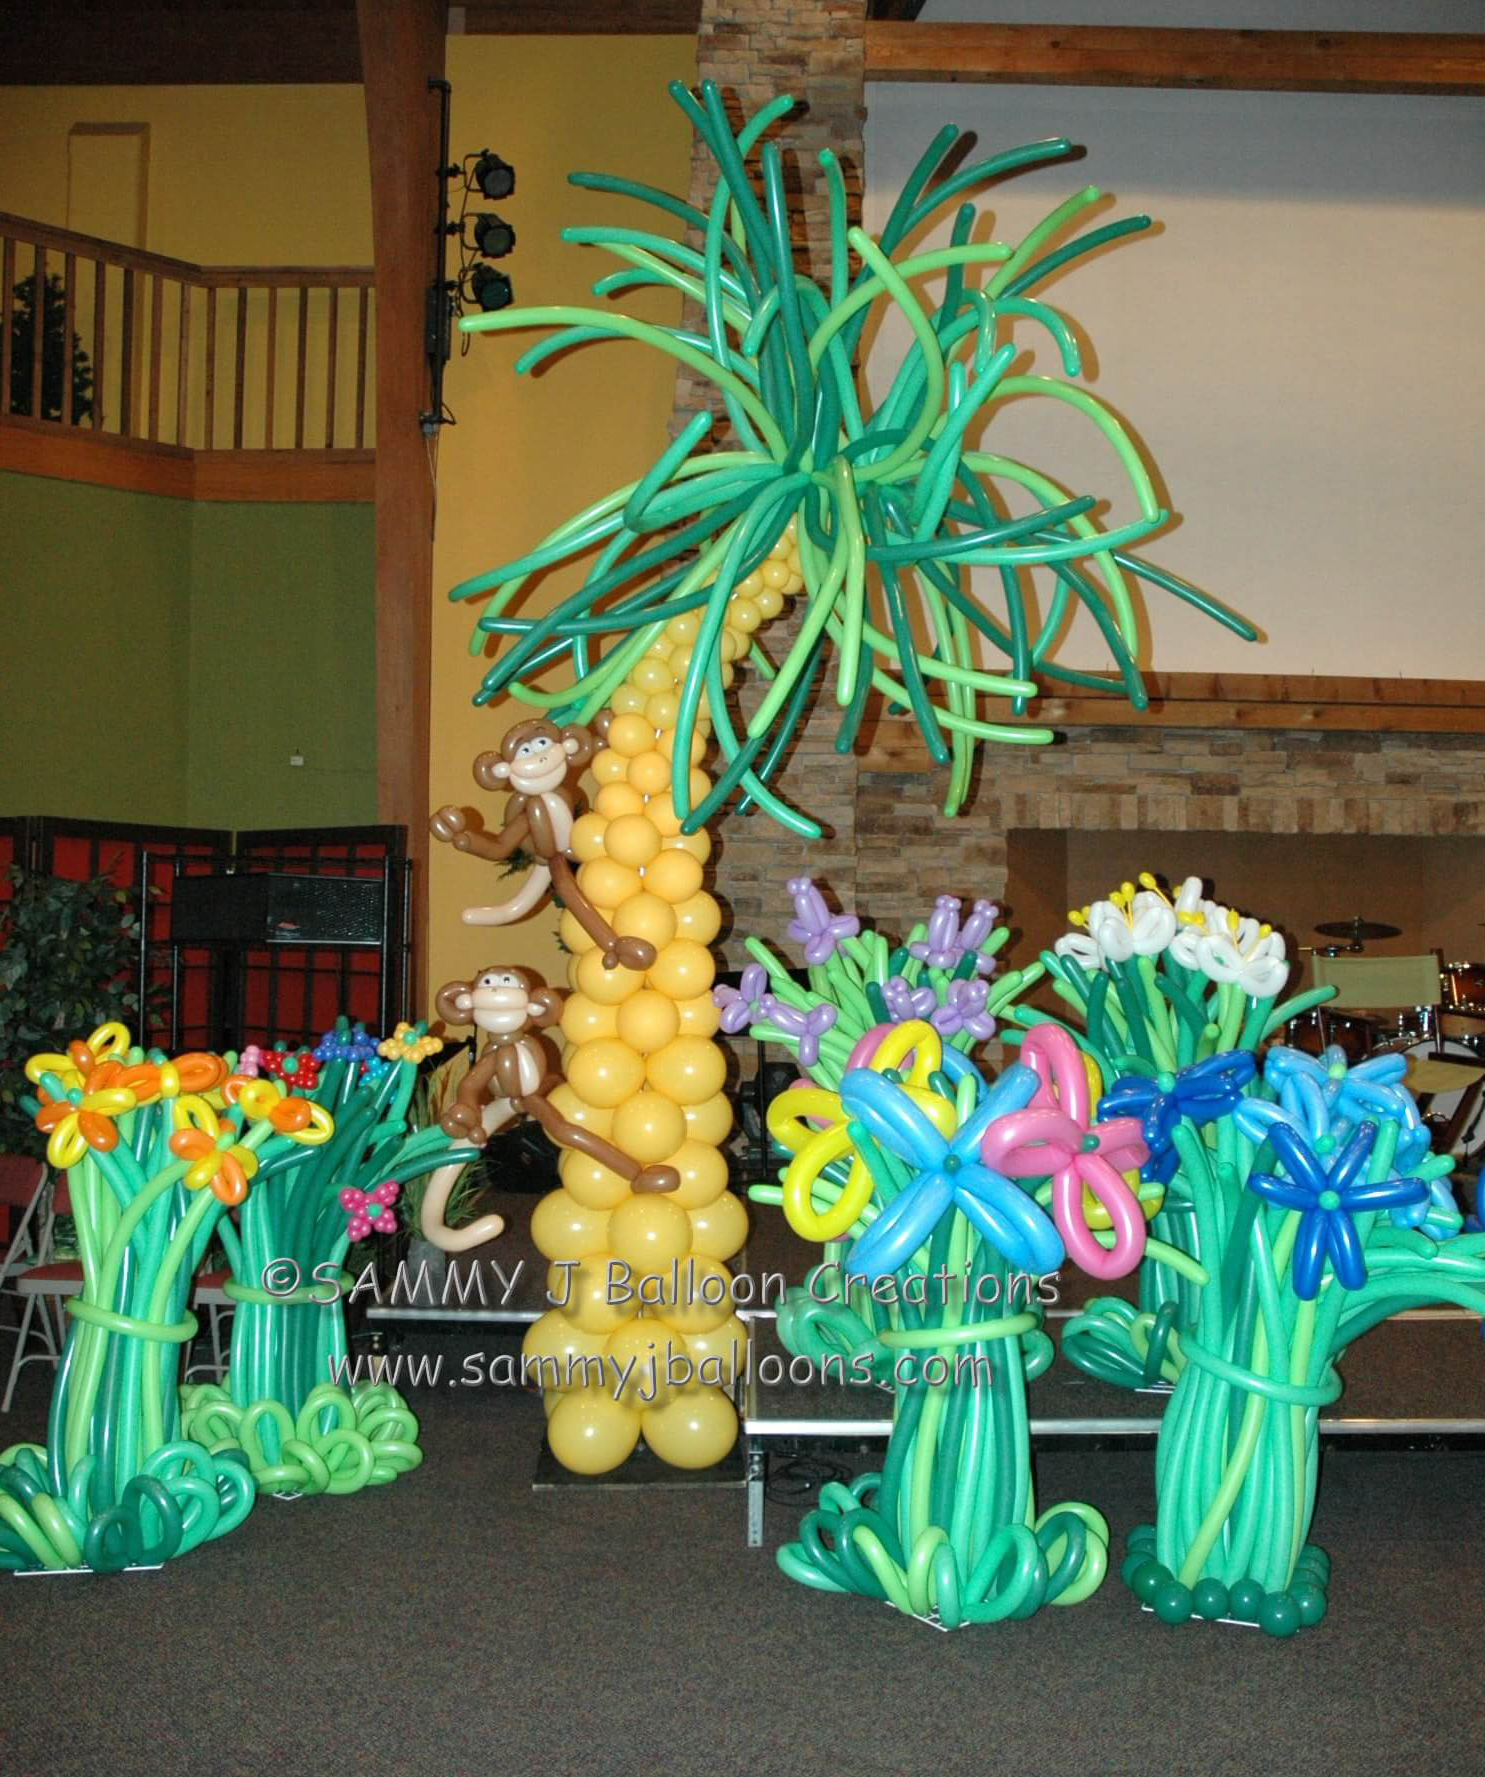 SAMMY J Balloon Creations st louis balloons monkey palm tree flowers